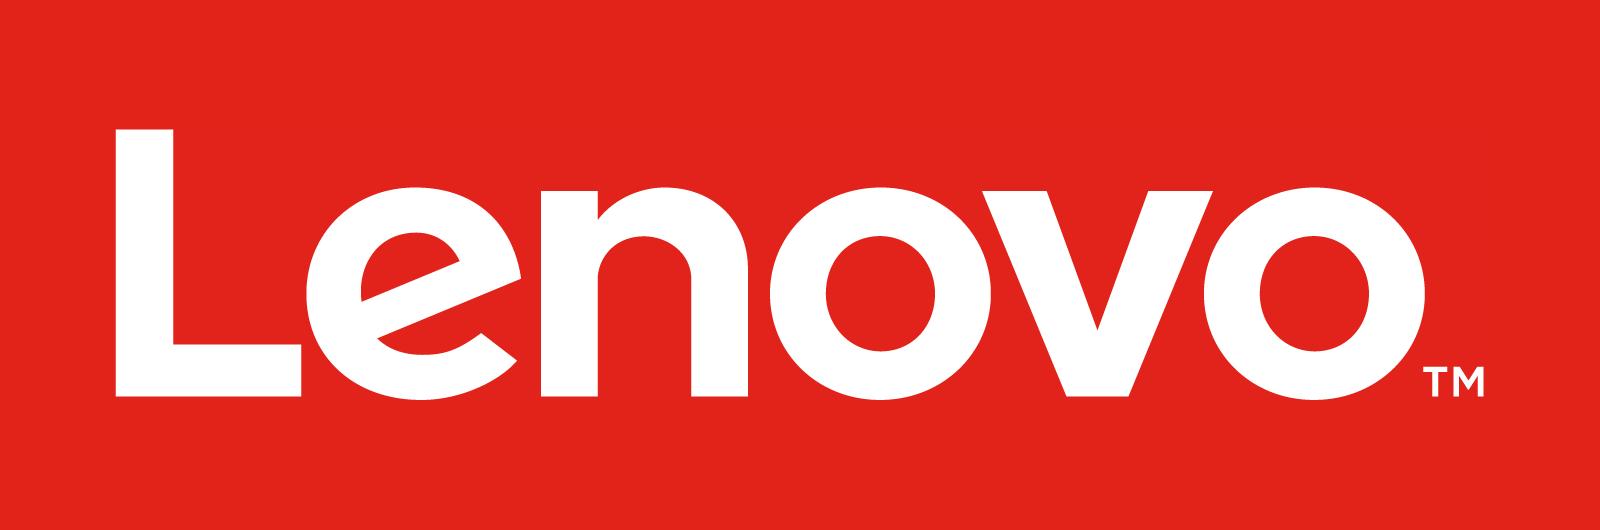 Assistenza Lenovo Roma